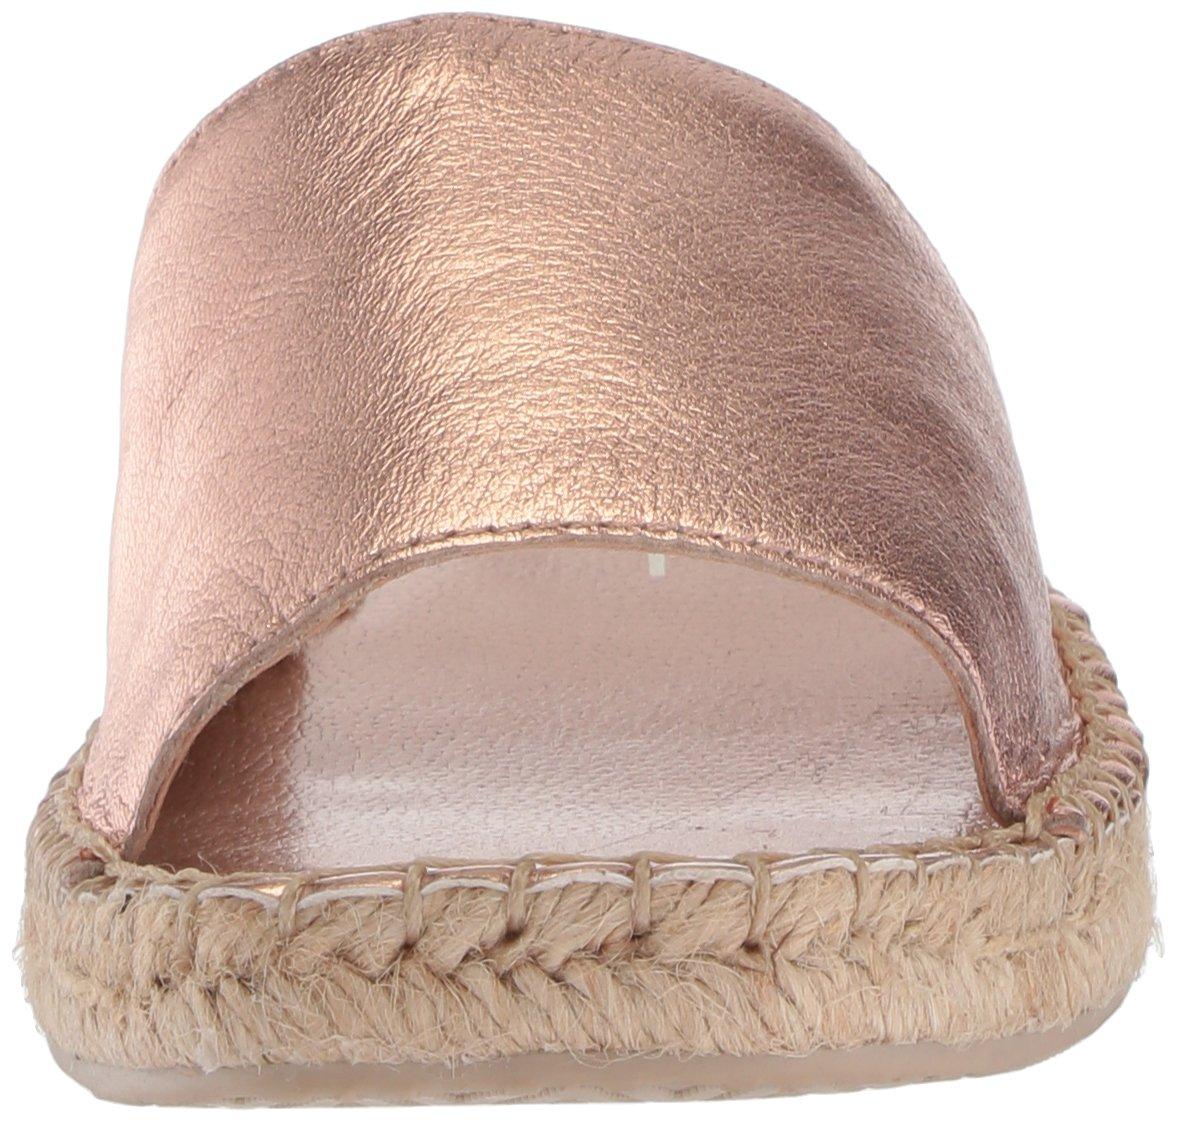 Dolce Vita Women's Bobbi Slide Sandal B077QK9W23 6 B(M) US|Rose Gold Leather